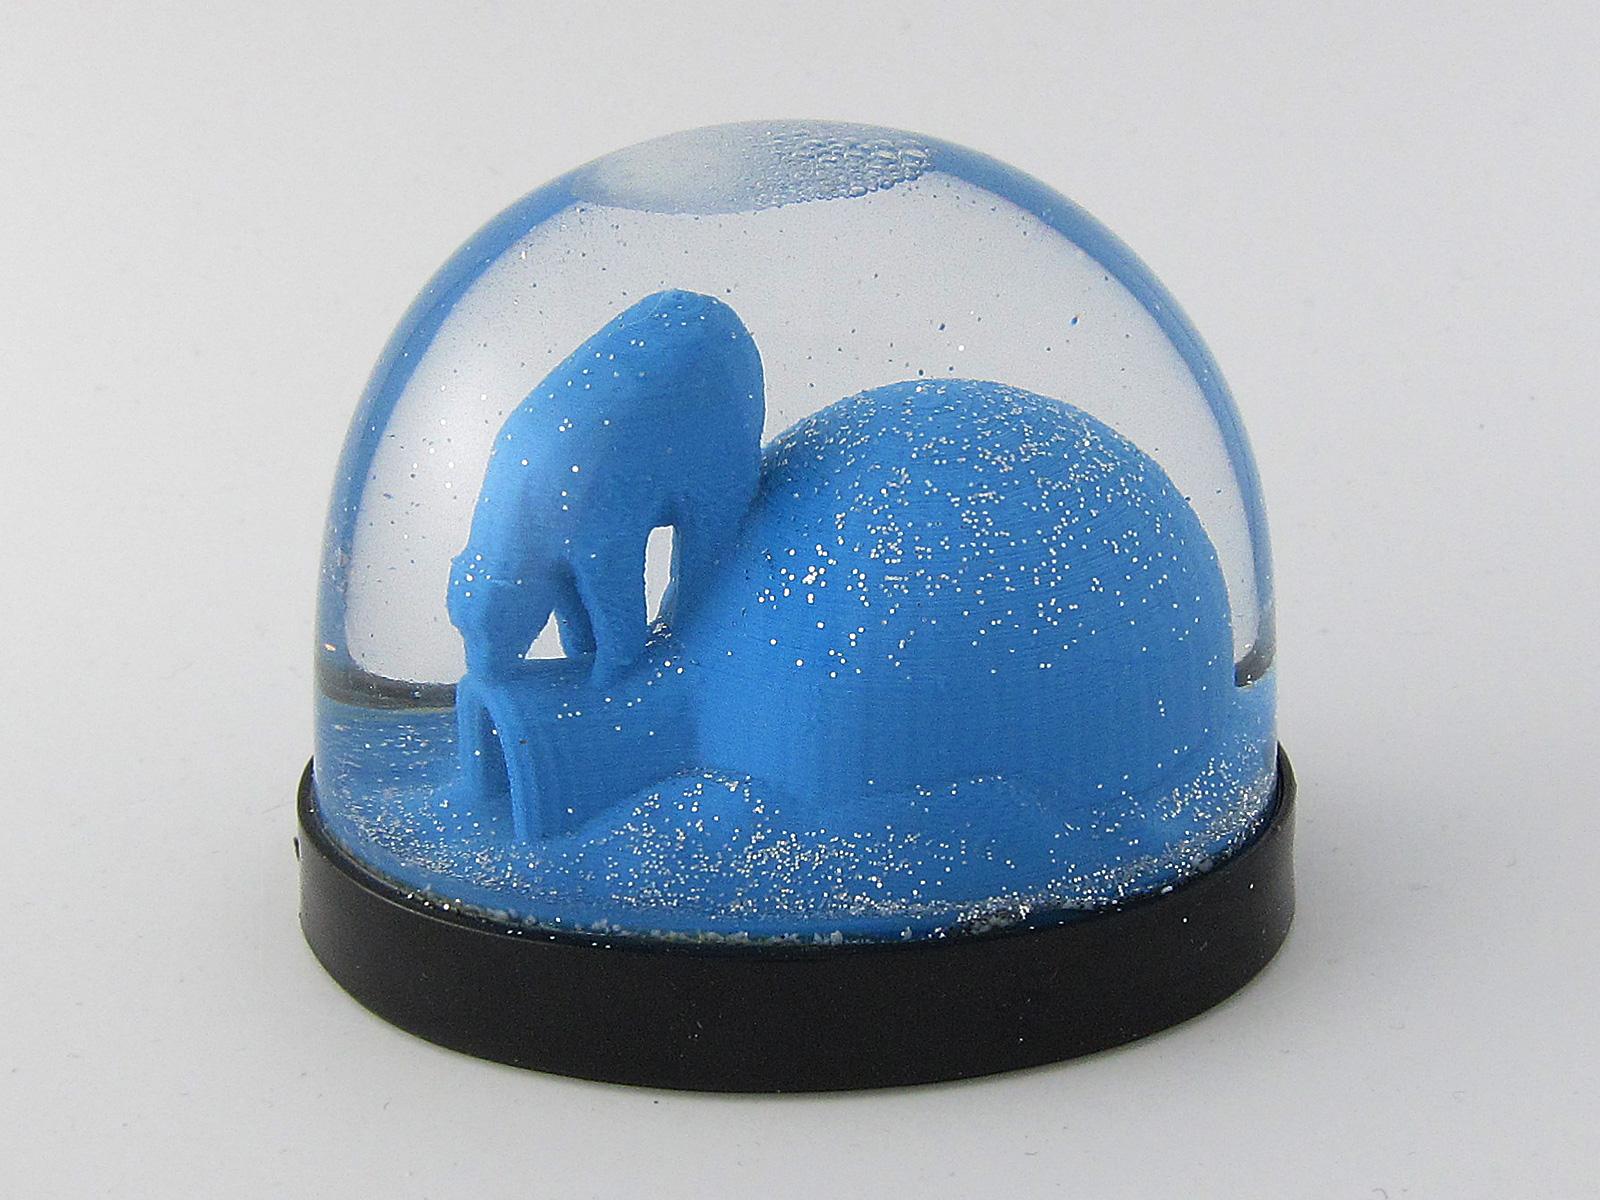 snowdome-kunstschneekugel-003-Eisbaer-Iglu